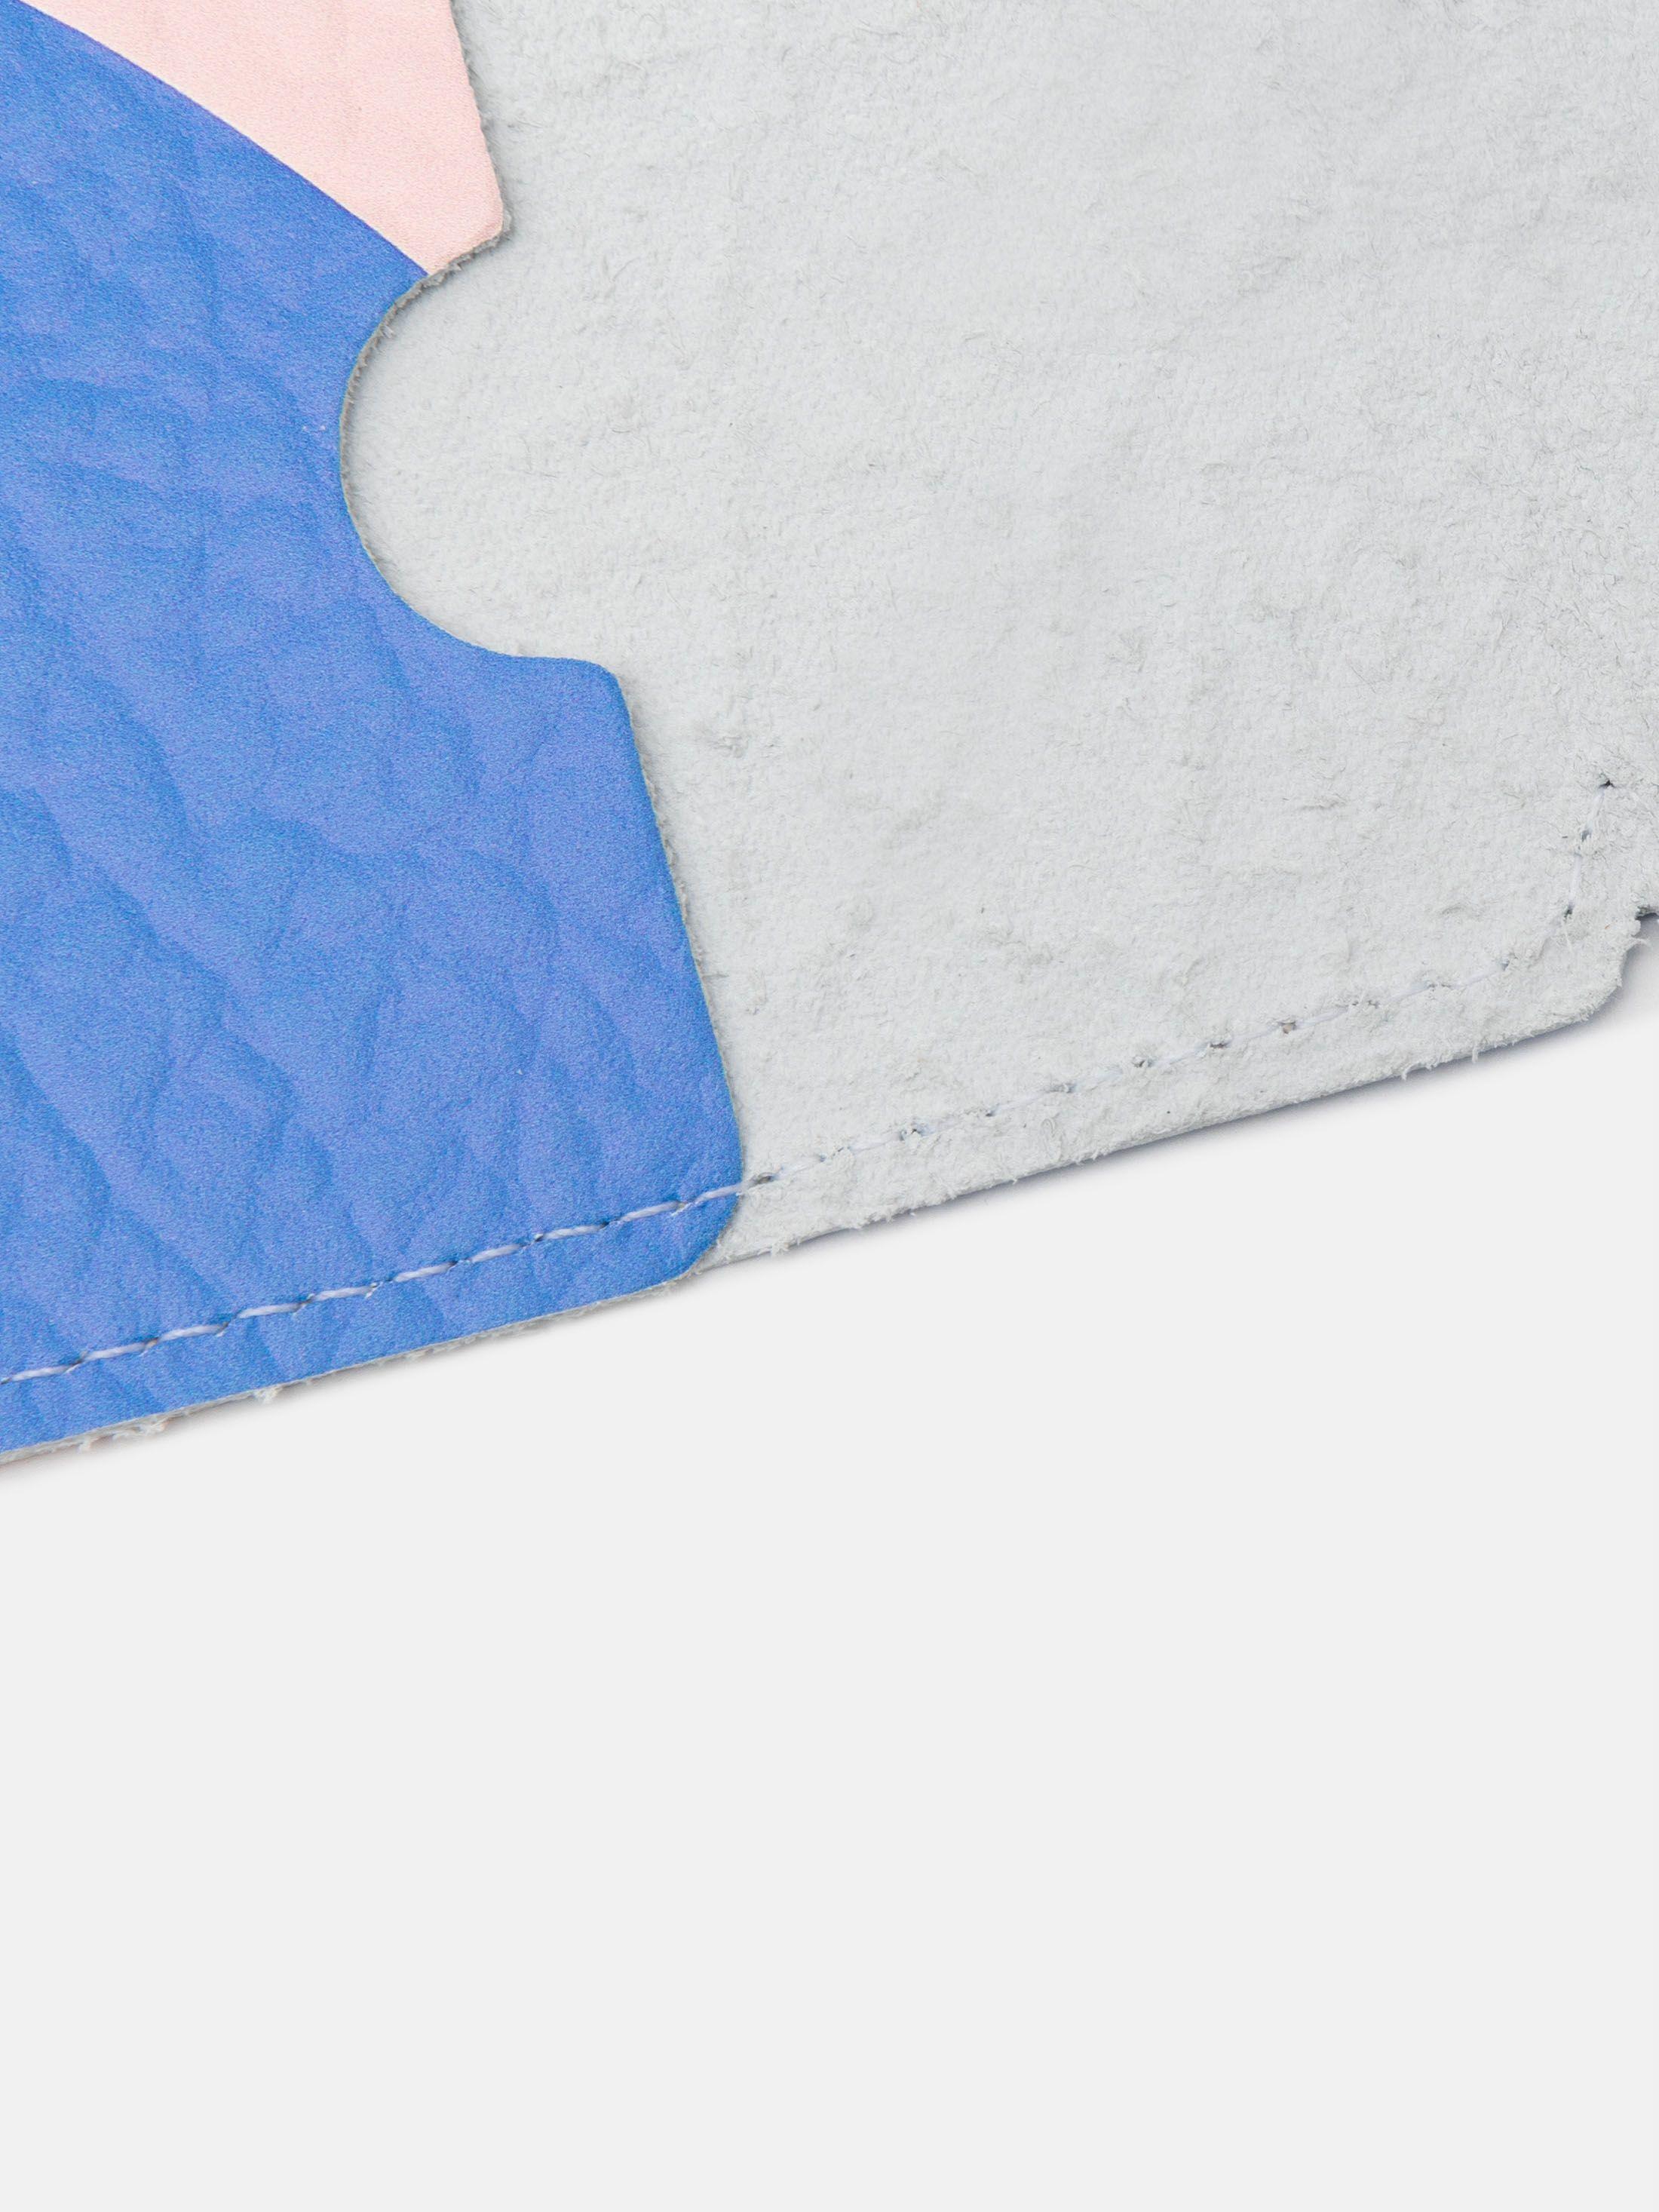 kortfodral av läder med eget tryck